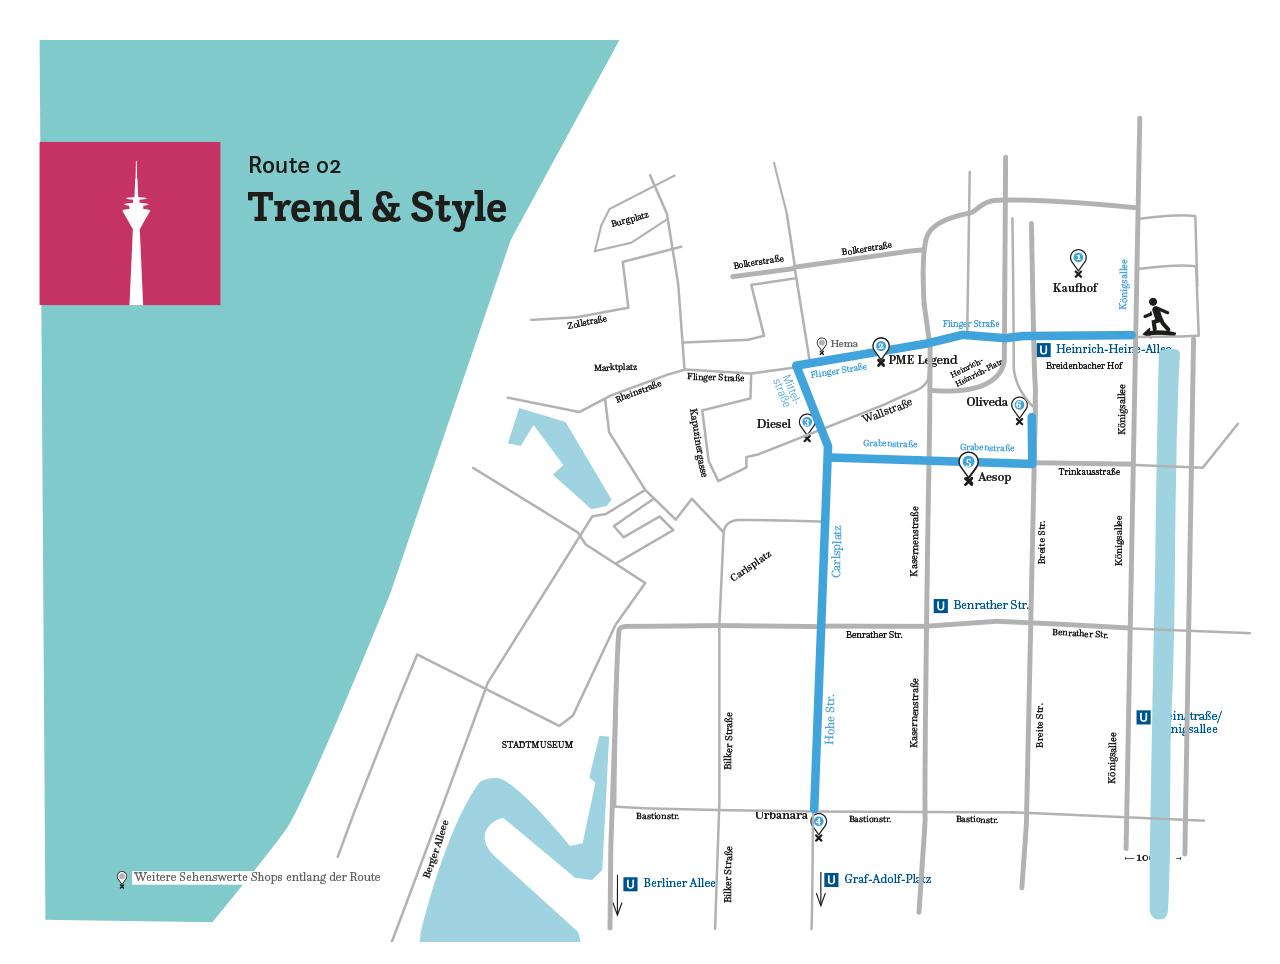 Düsseldorf – Trend & Style